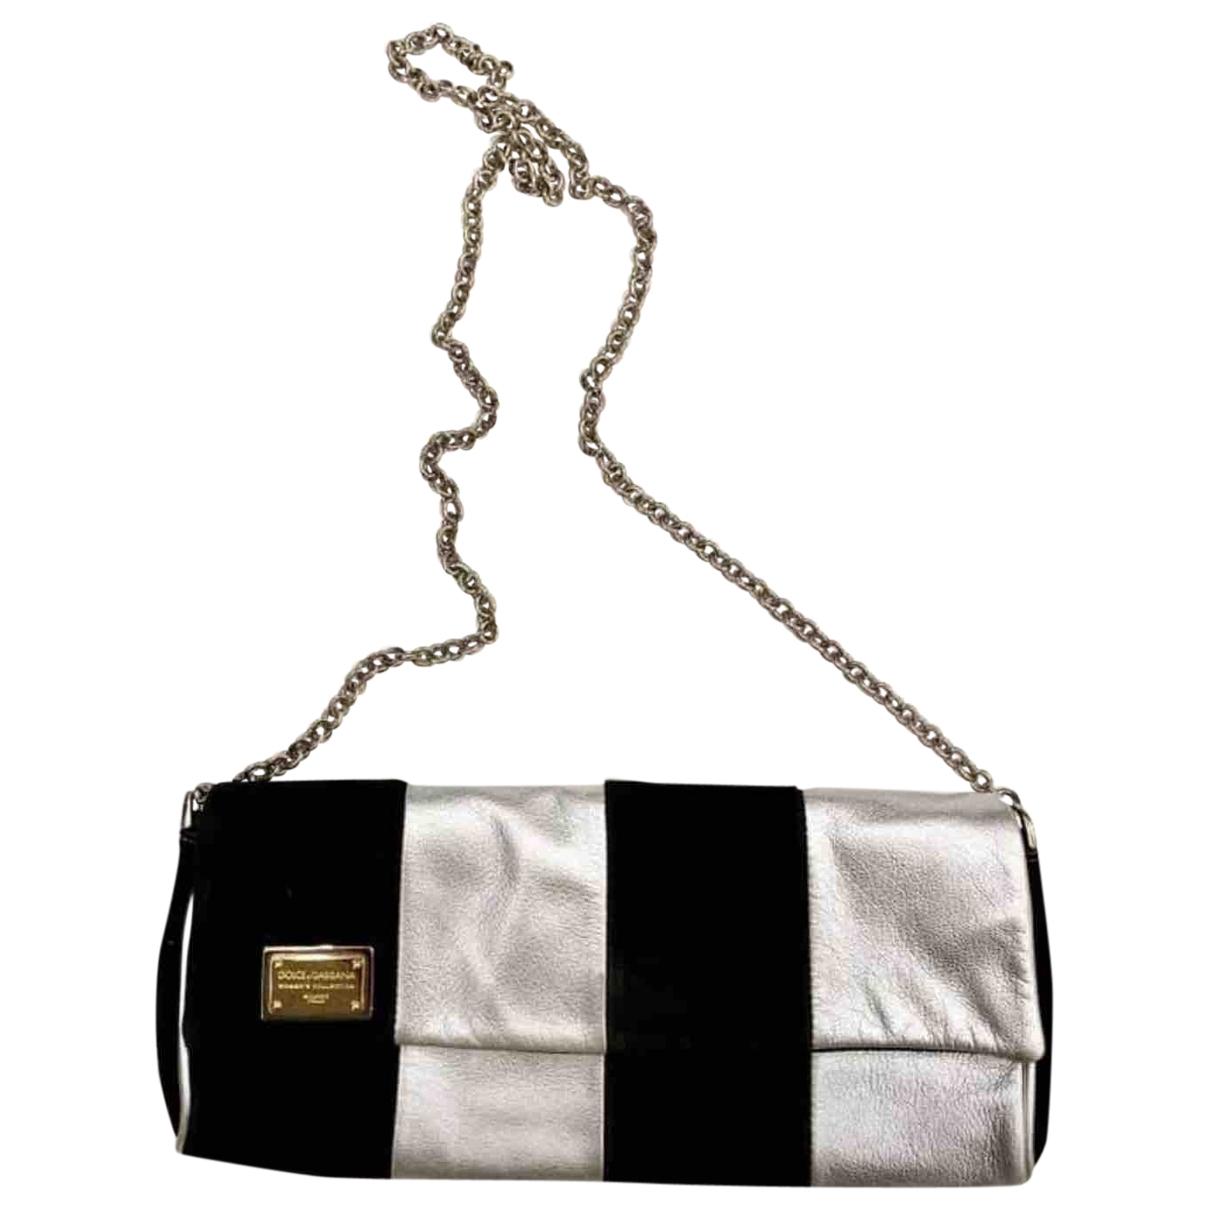 Dolce & Gabbana \N Multicolour Leather Clutch bag for Women \N